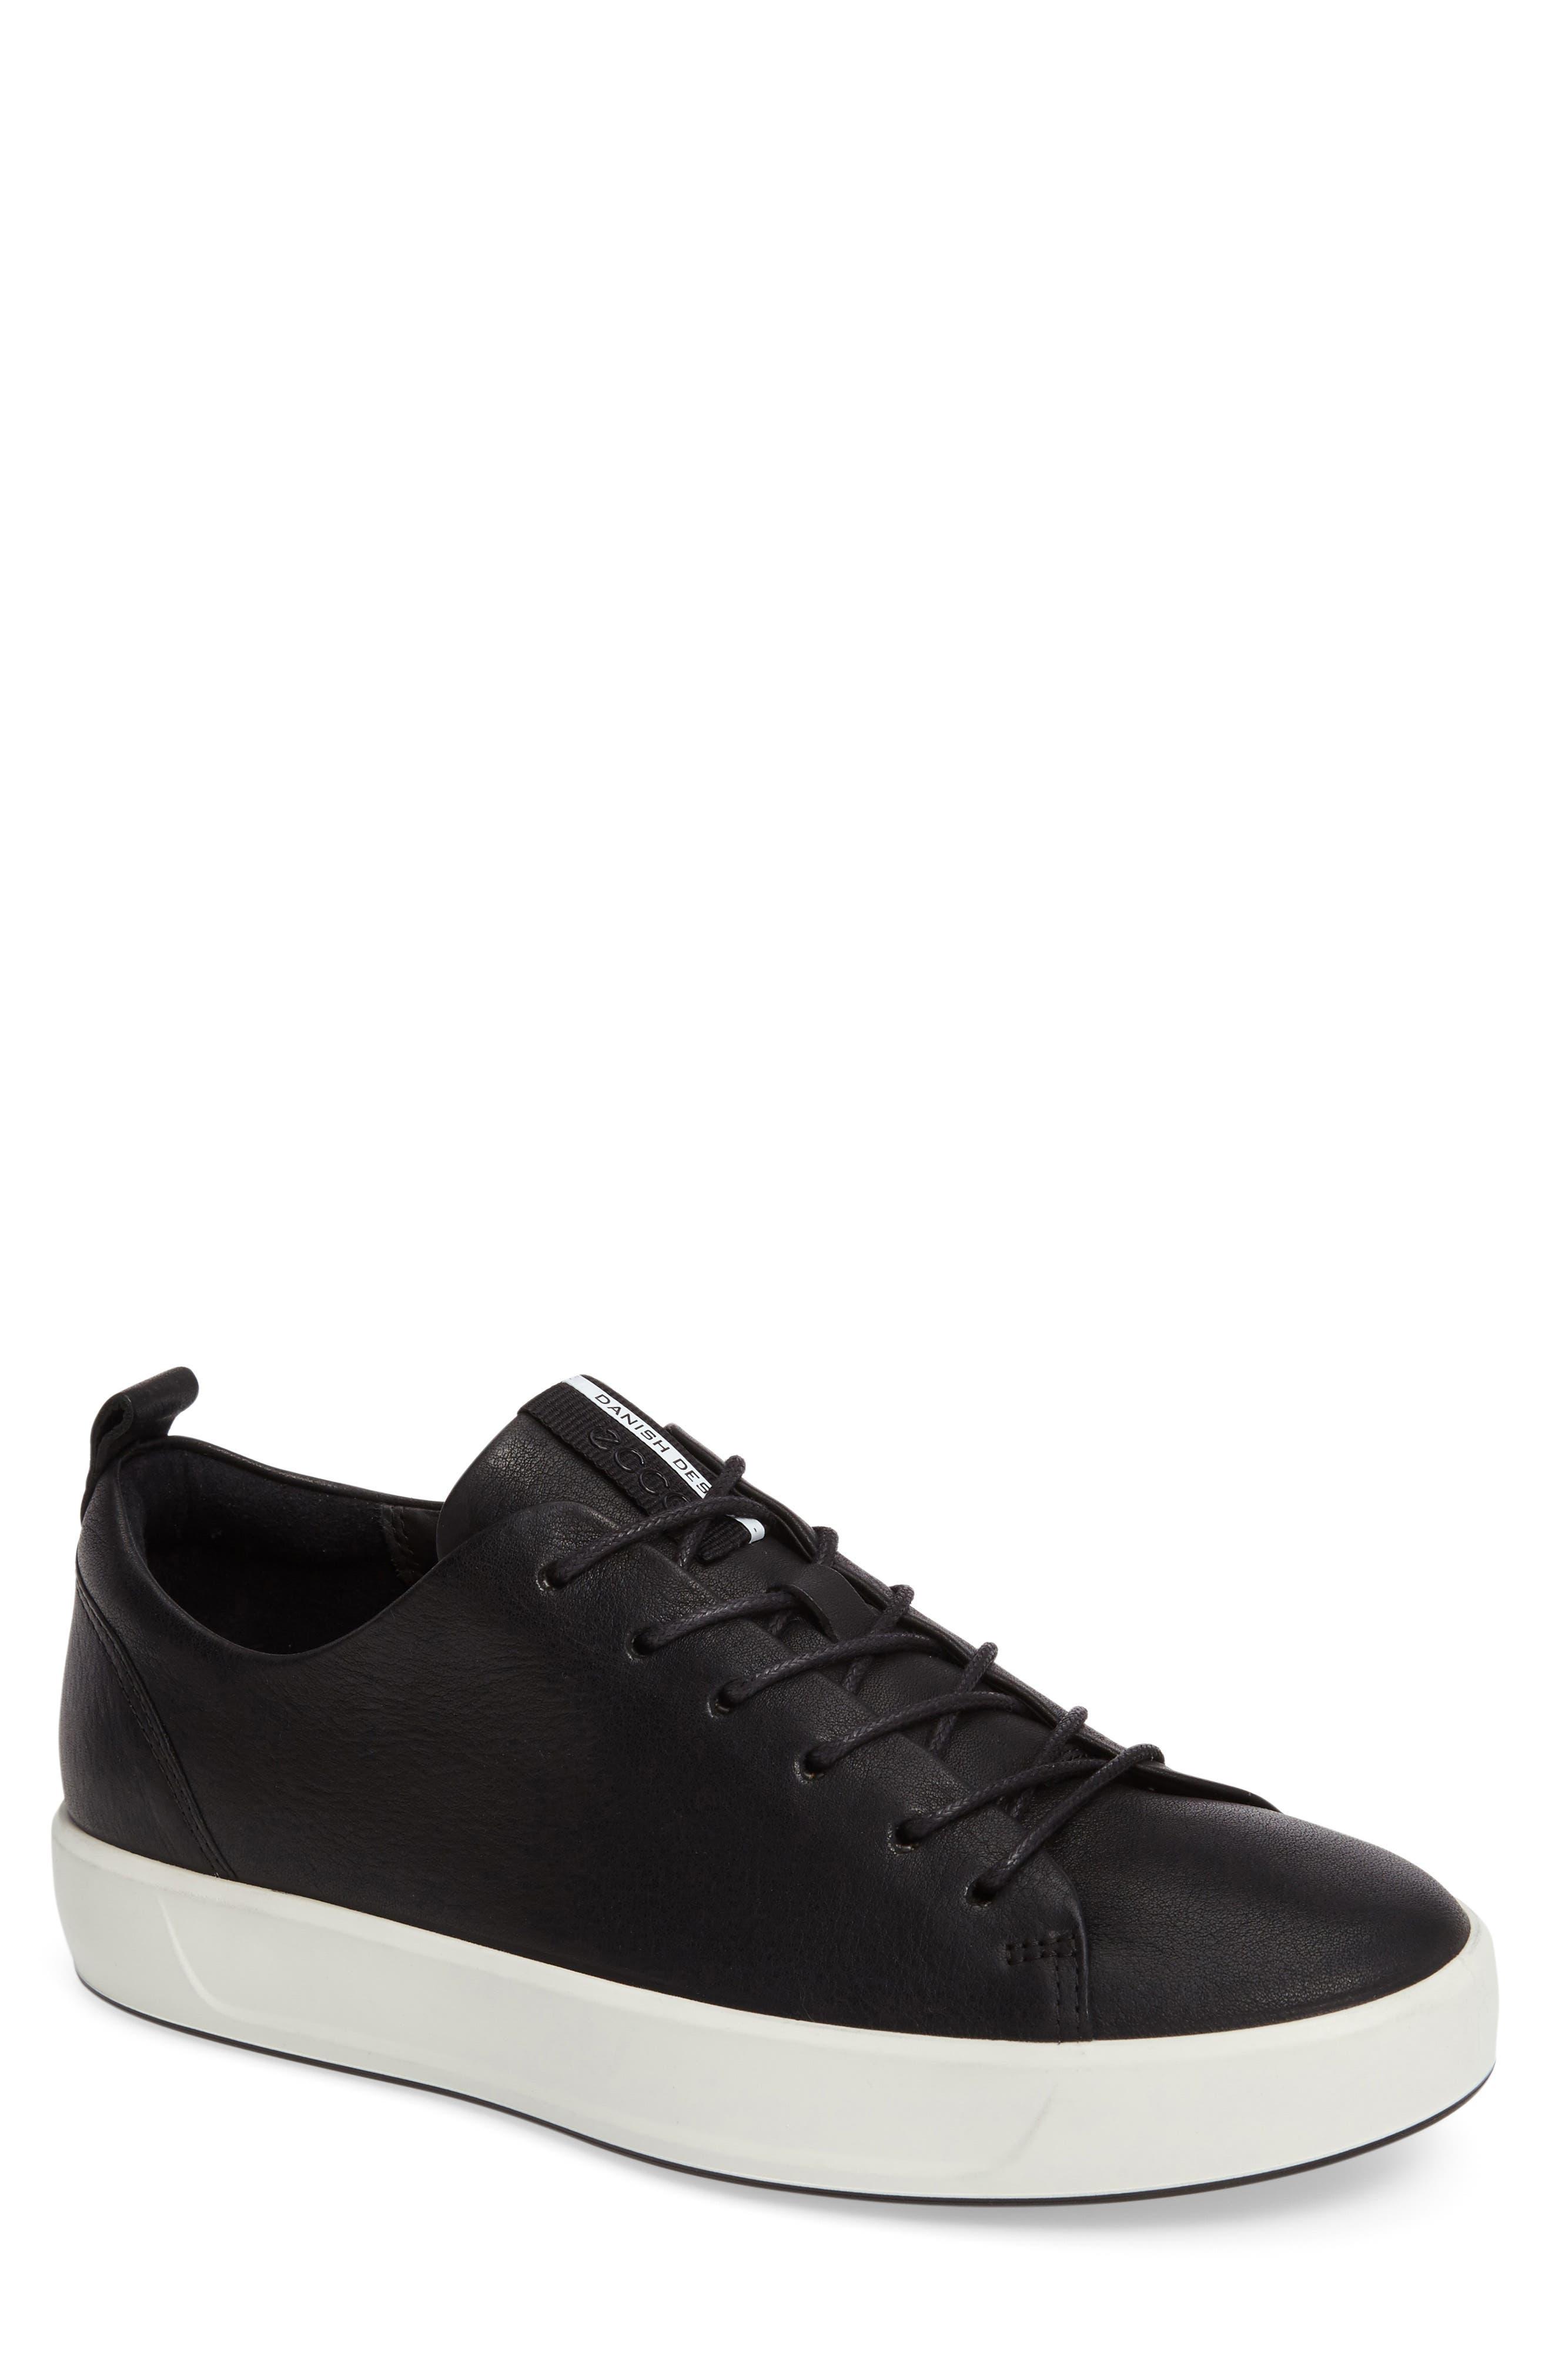 Soft 8 Sneaker,                         Main,                         color, BLACK